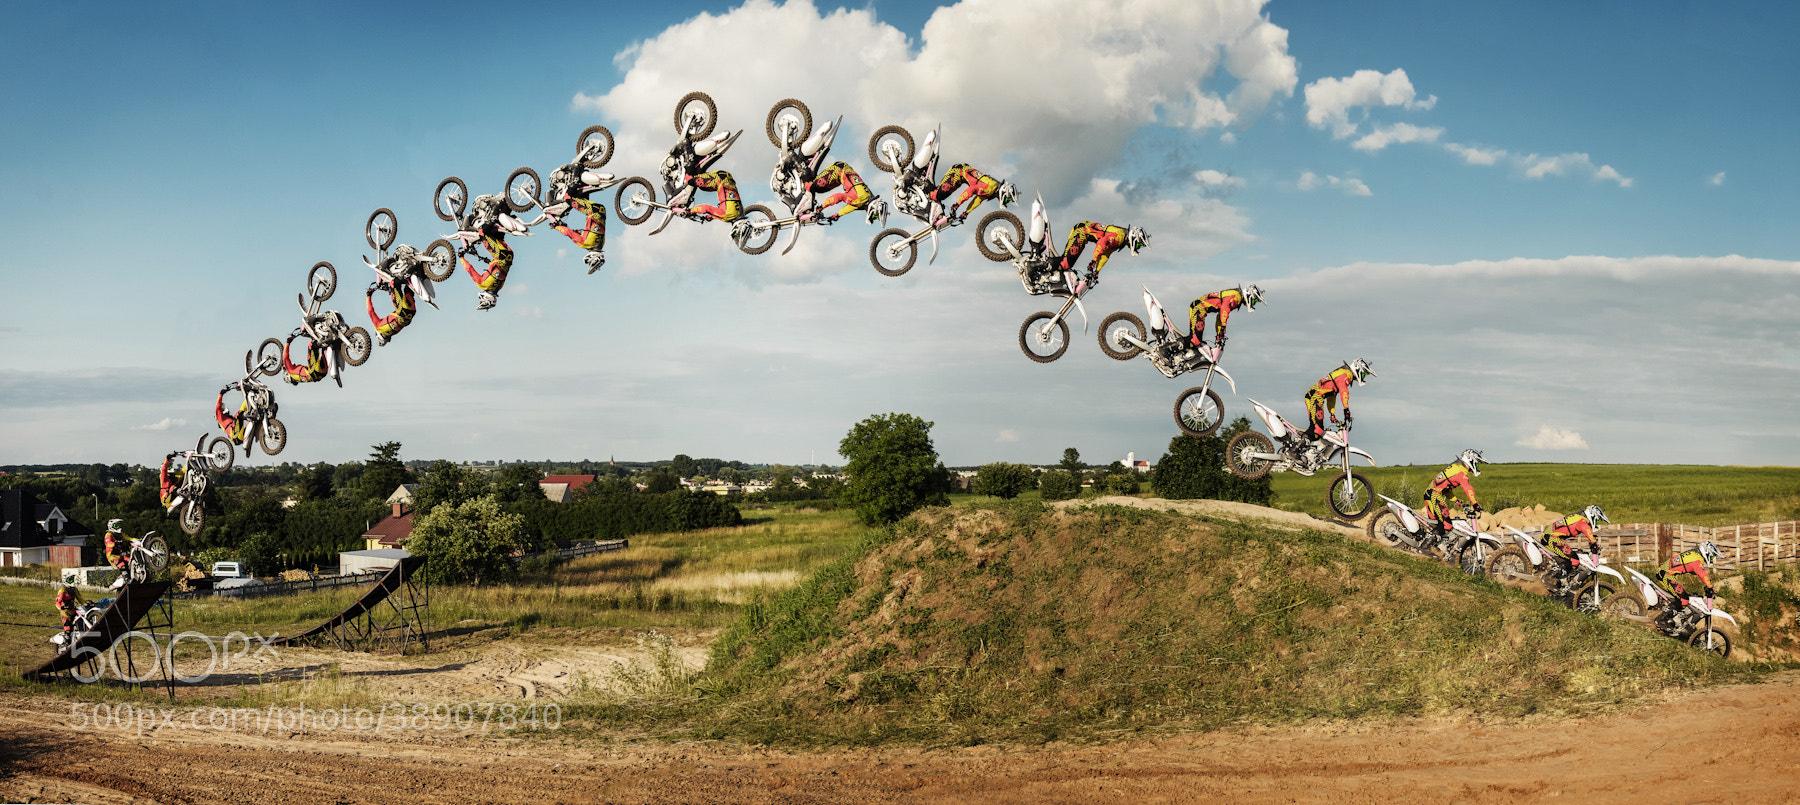 Photograph FMX Backflip by Jacek Woźniak on 500px